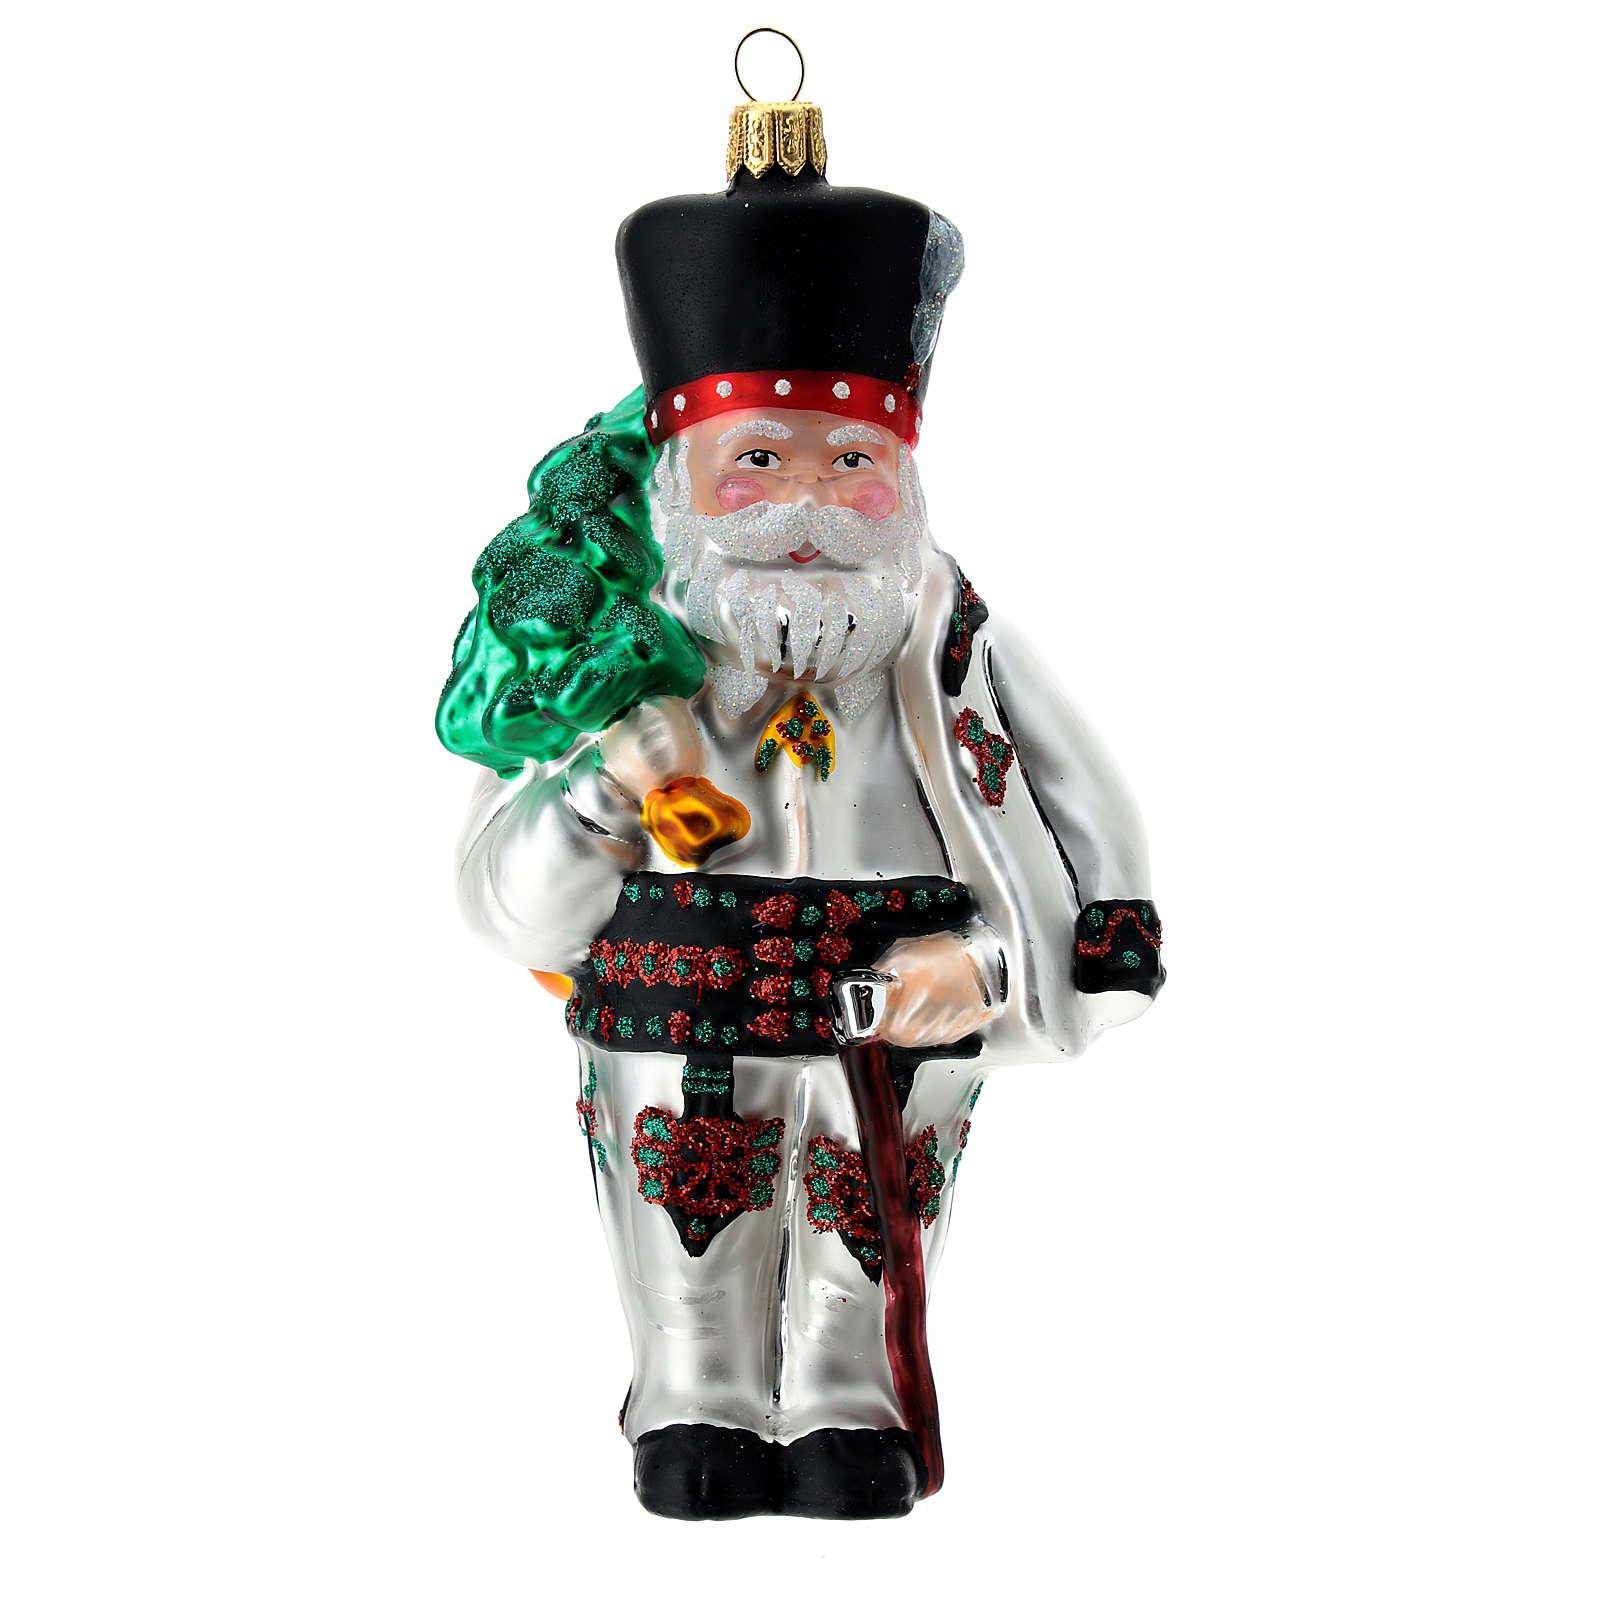 Polish Santa Claus blown glass Christmas ornament 4